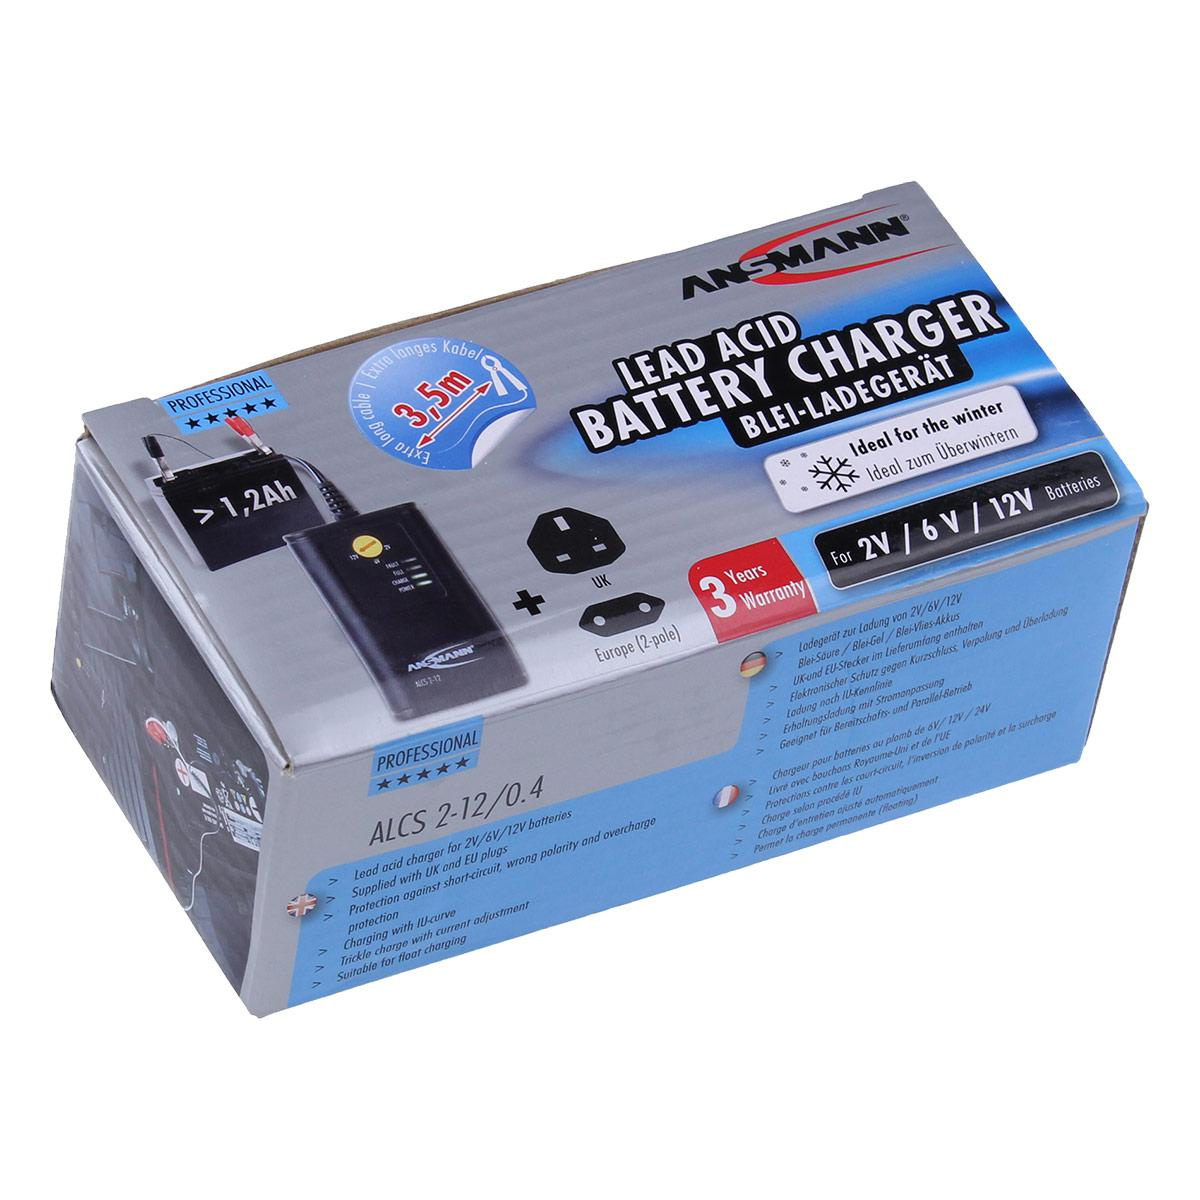 Ansmann Alcs2 12 04 Charger For 2v 6v And 12v Lead Acid Sla Batteries Sealed Battery Circuit Multi Buy Prices